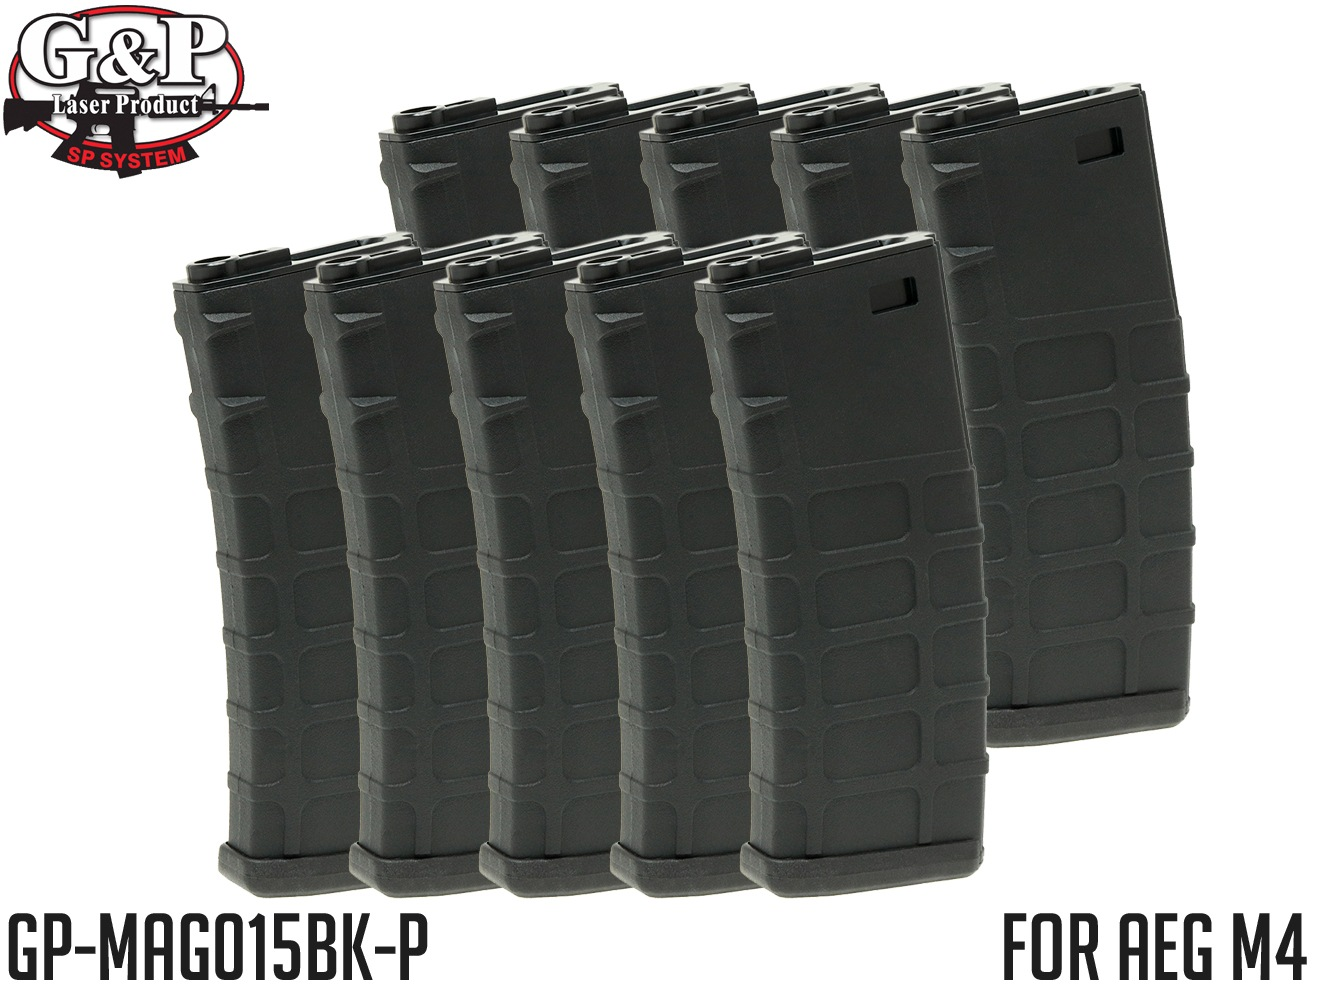 G&P GMAG 340Rds マガジン AEG M4 BK 10本セット◆MADBULLライセンス ゼンマイ式 HIGHCAP 電動M4対応 G&G KRYTAC ICS ARES APS S&T VFC WE